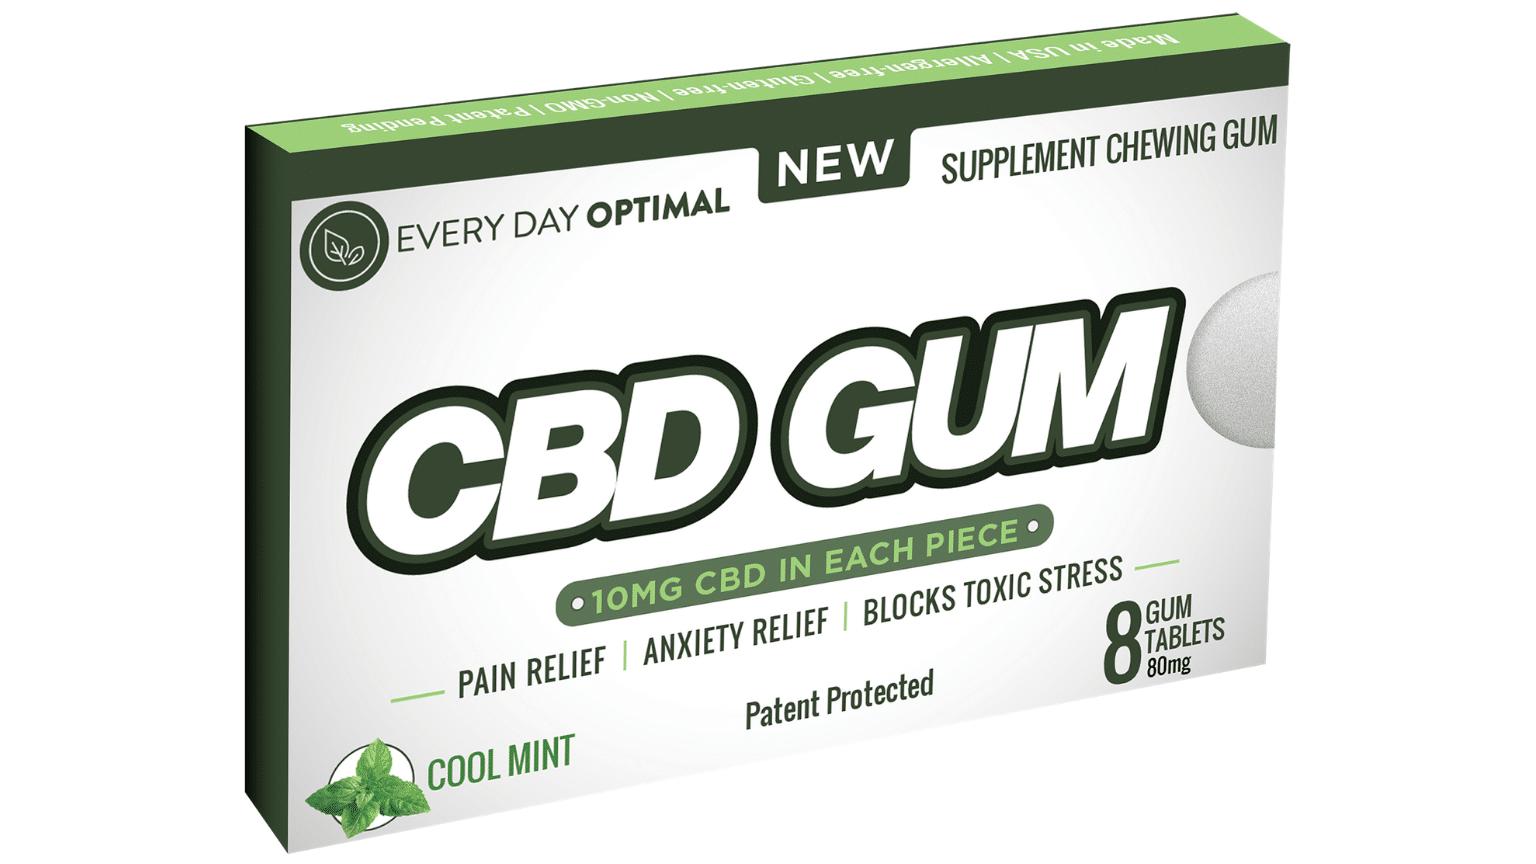 every-day-optimal-cbd-gum